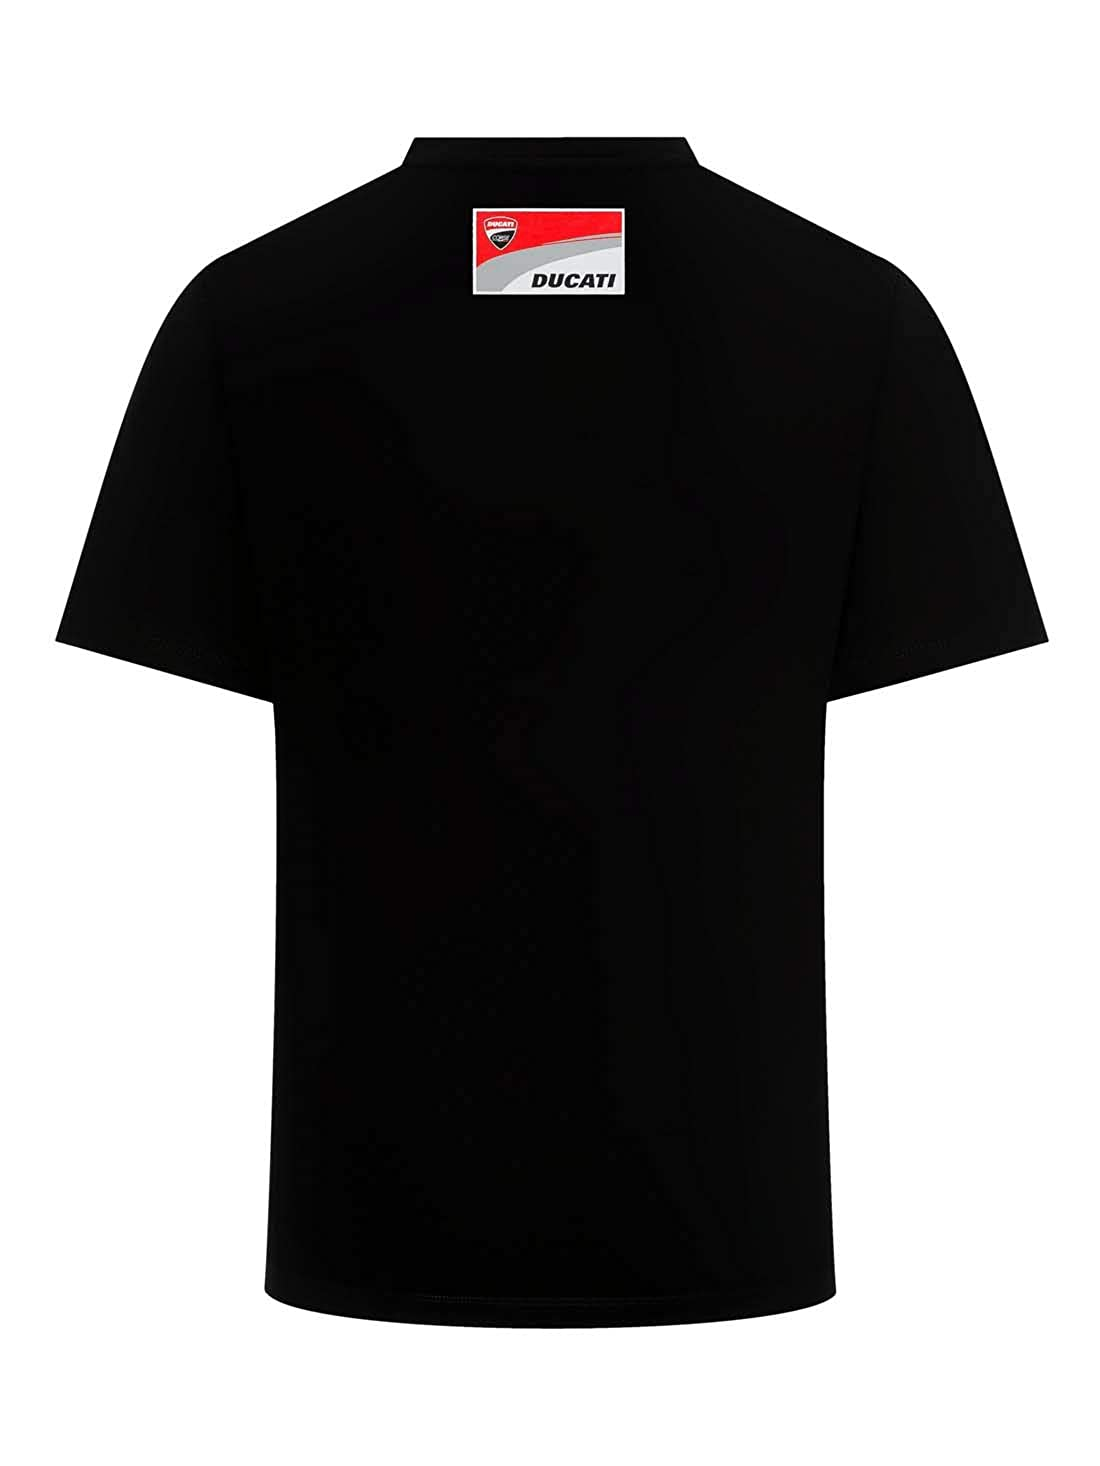 Ducati Corse T-Shirt Yoke Contrast